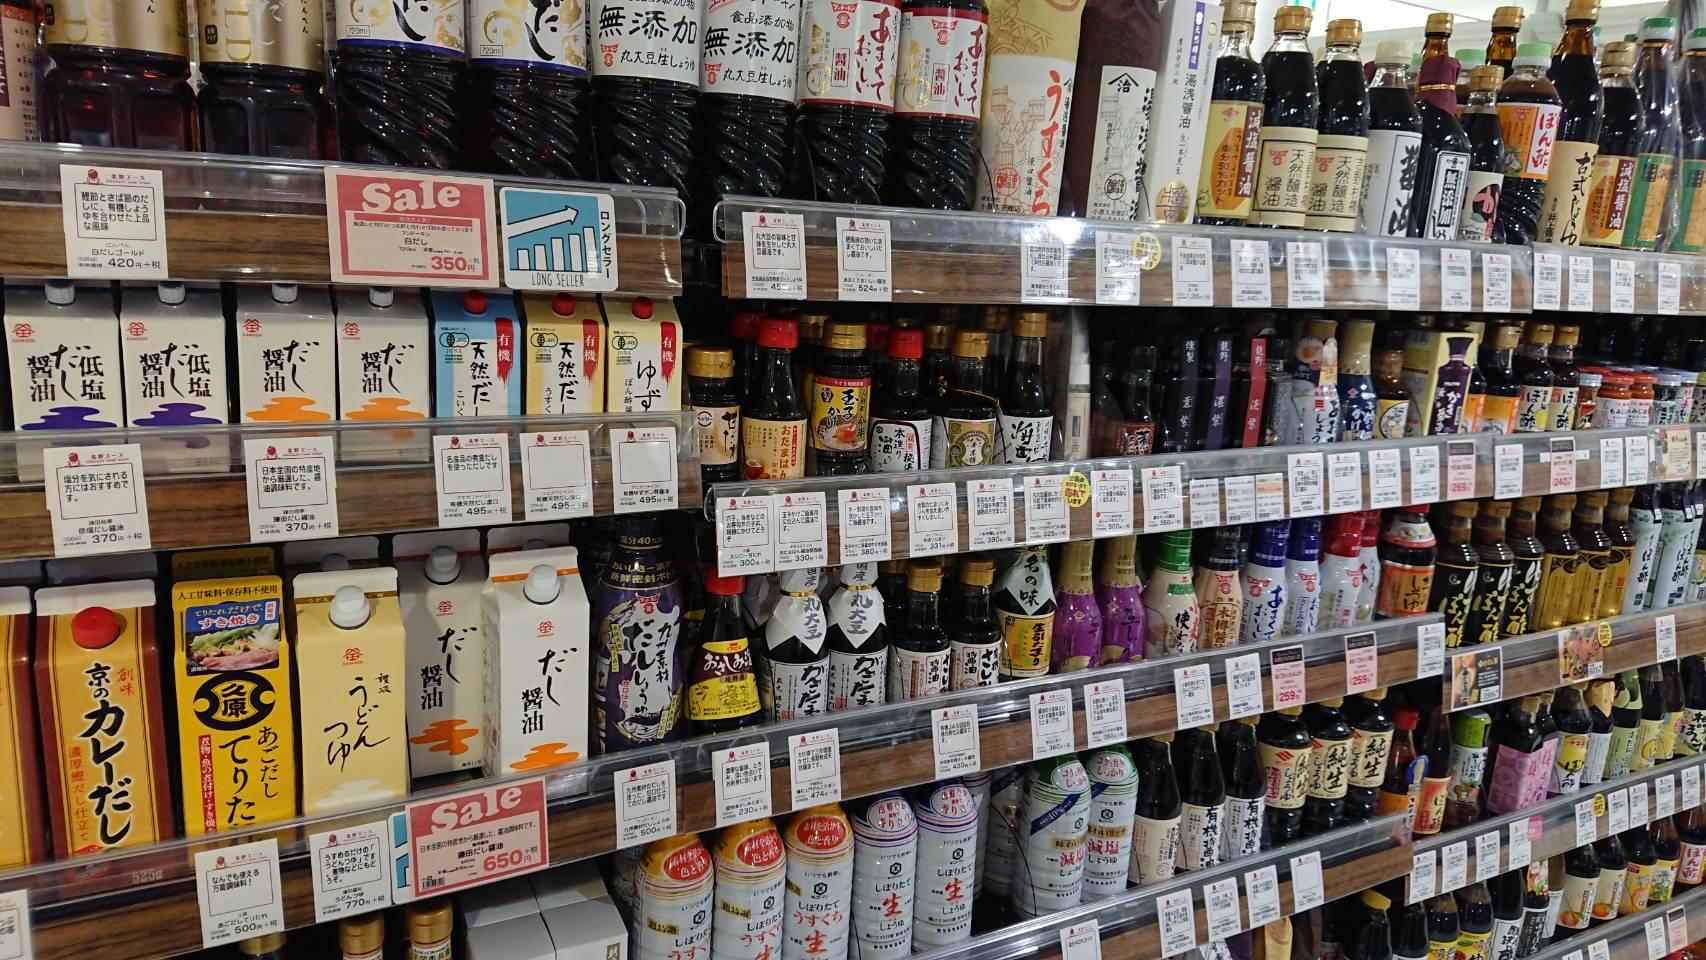 MOMOマルシェ(京都市伏見区)